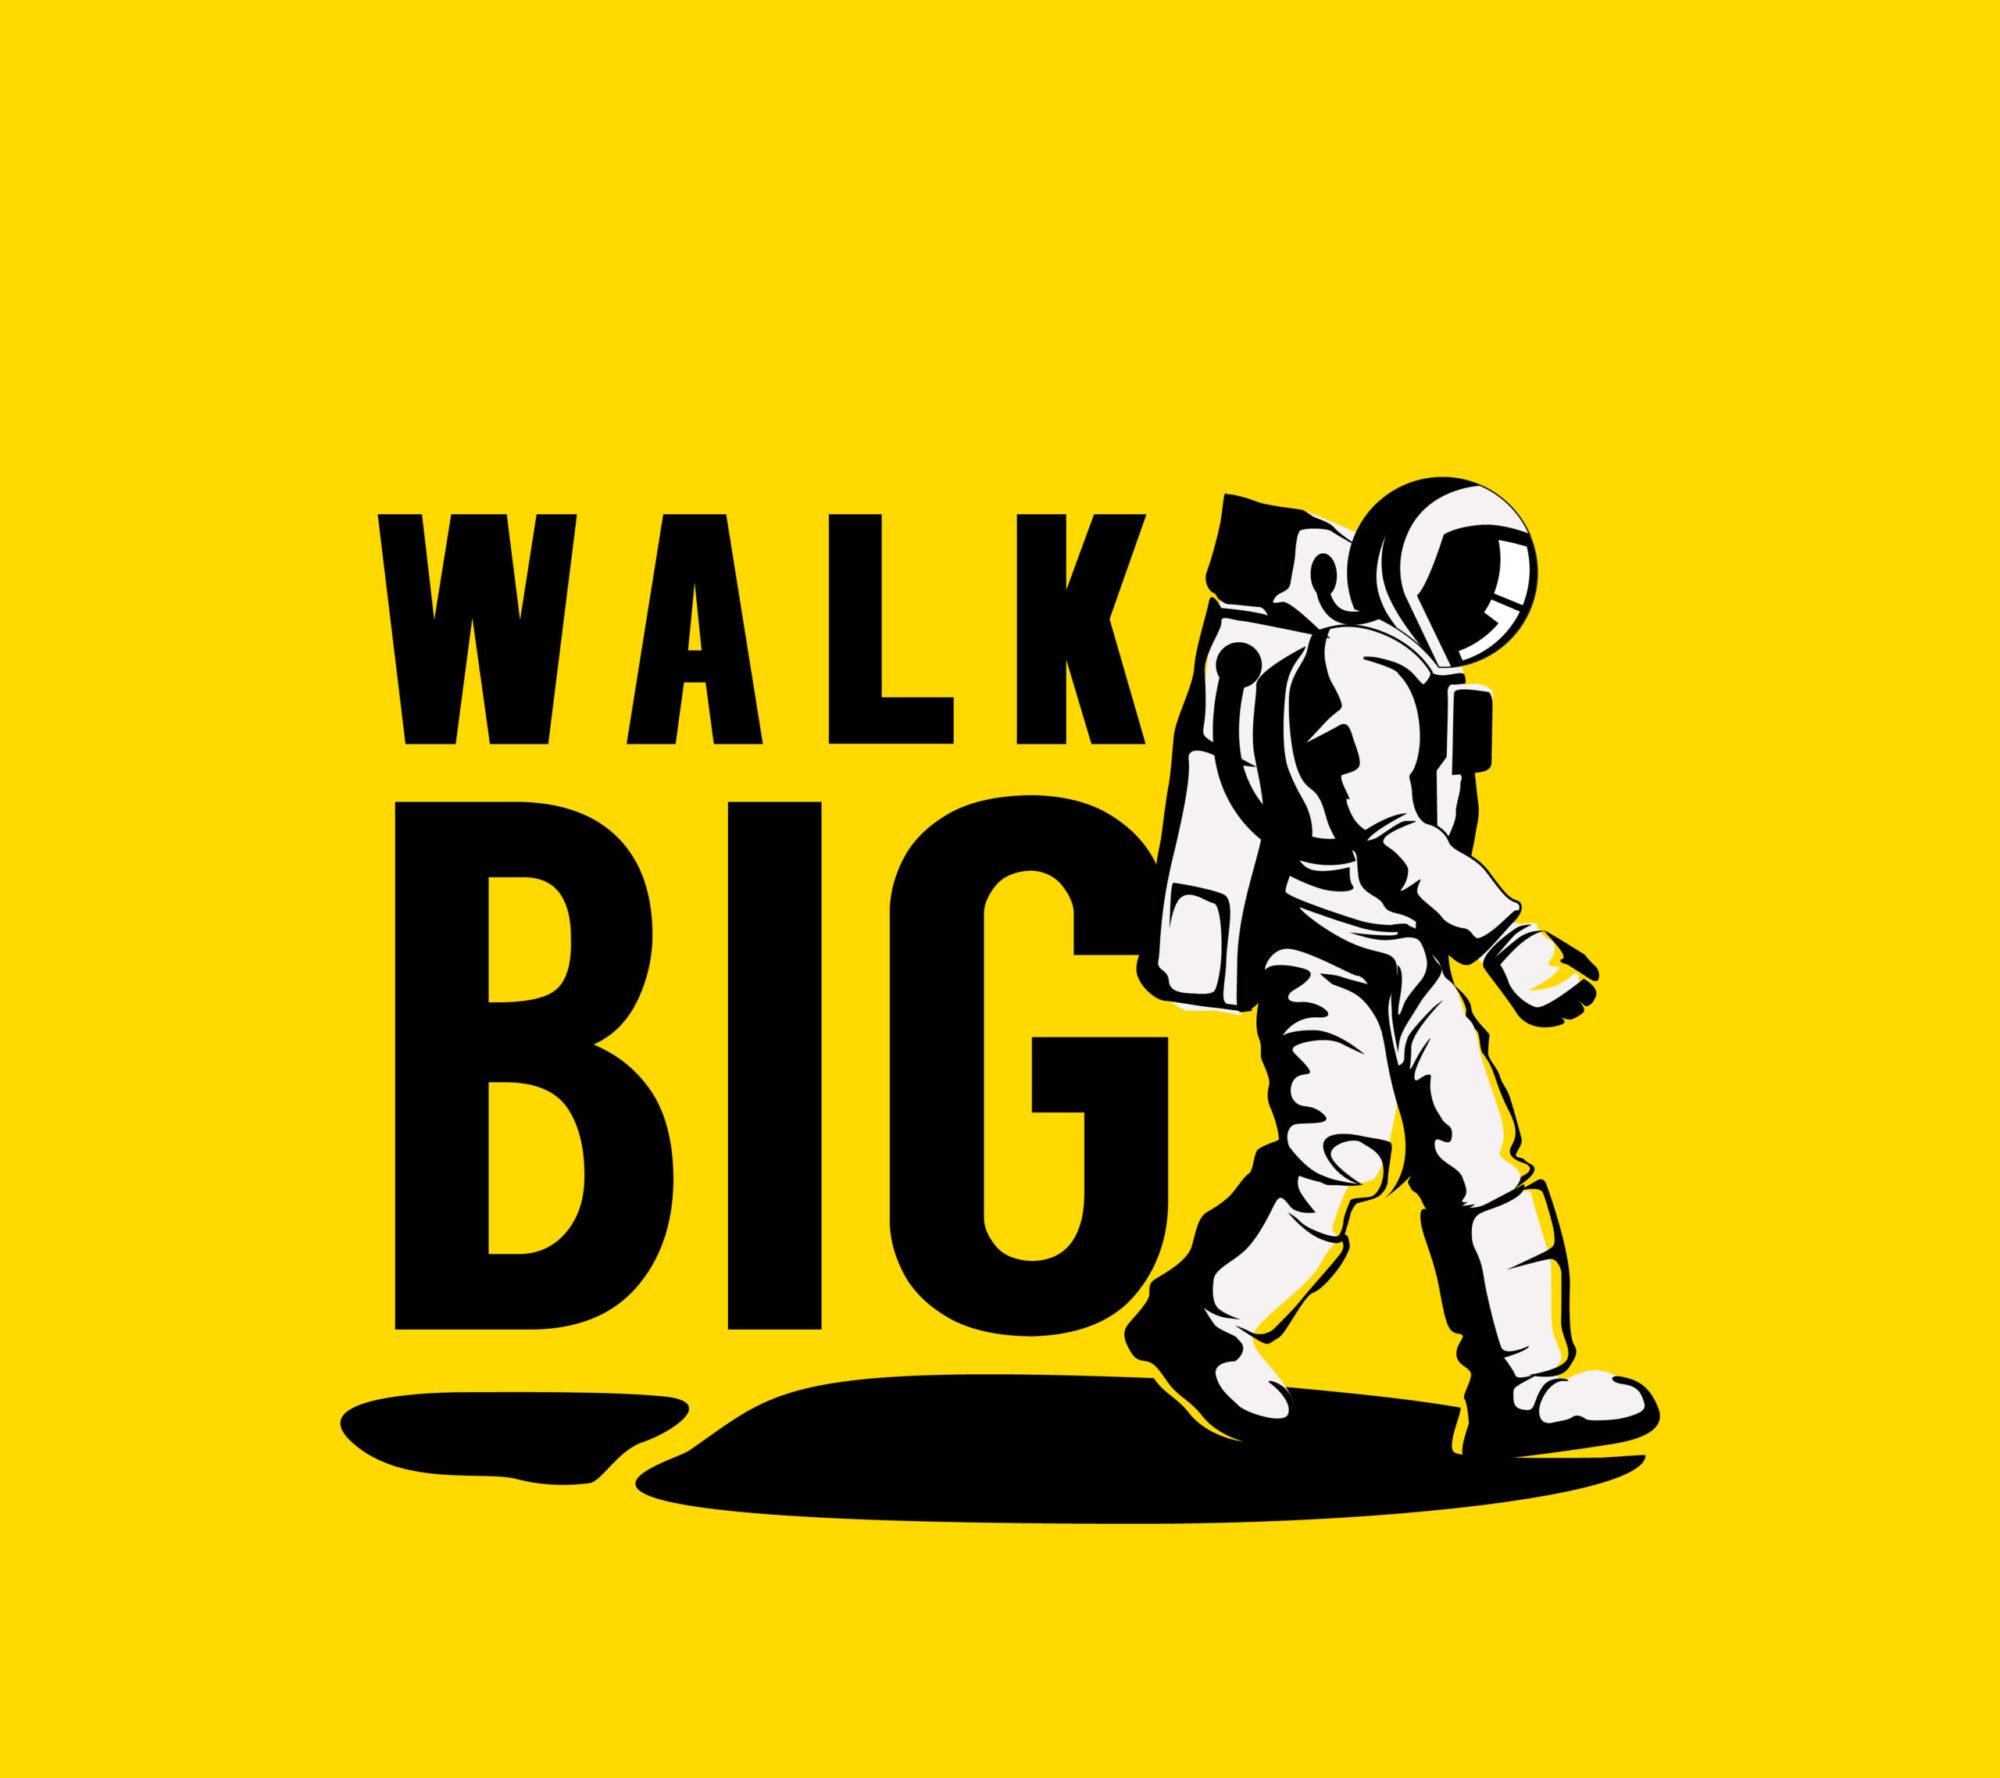 Walk Big